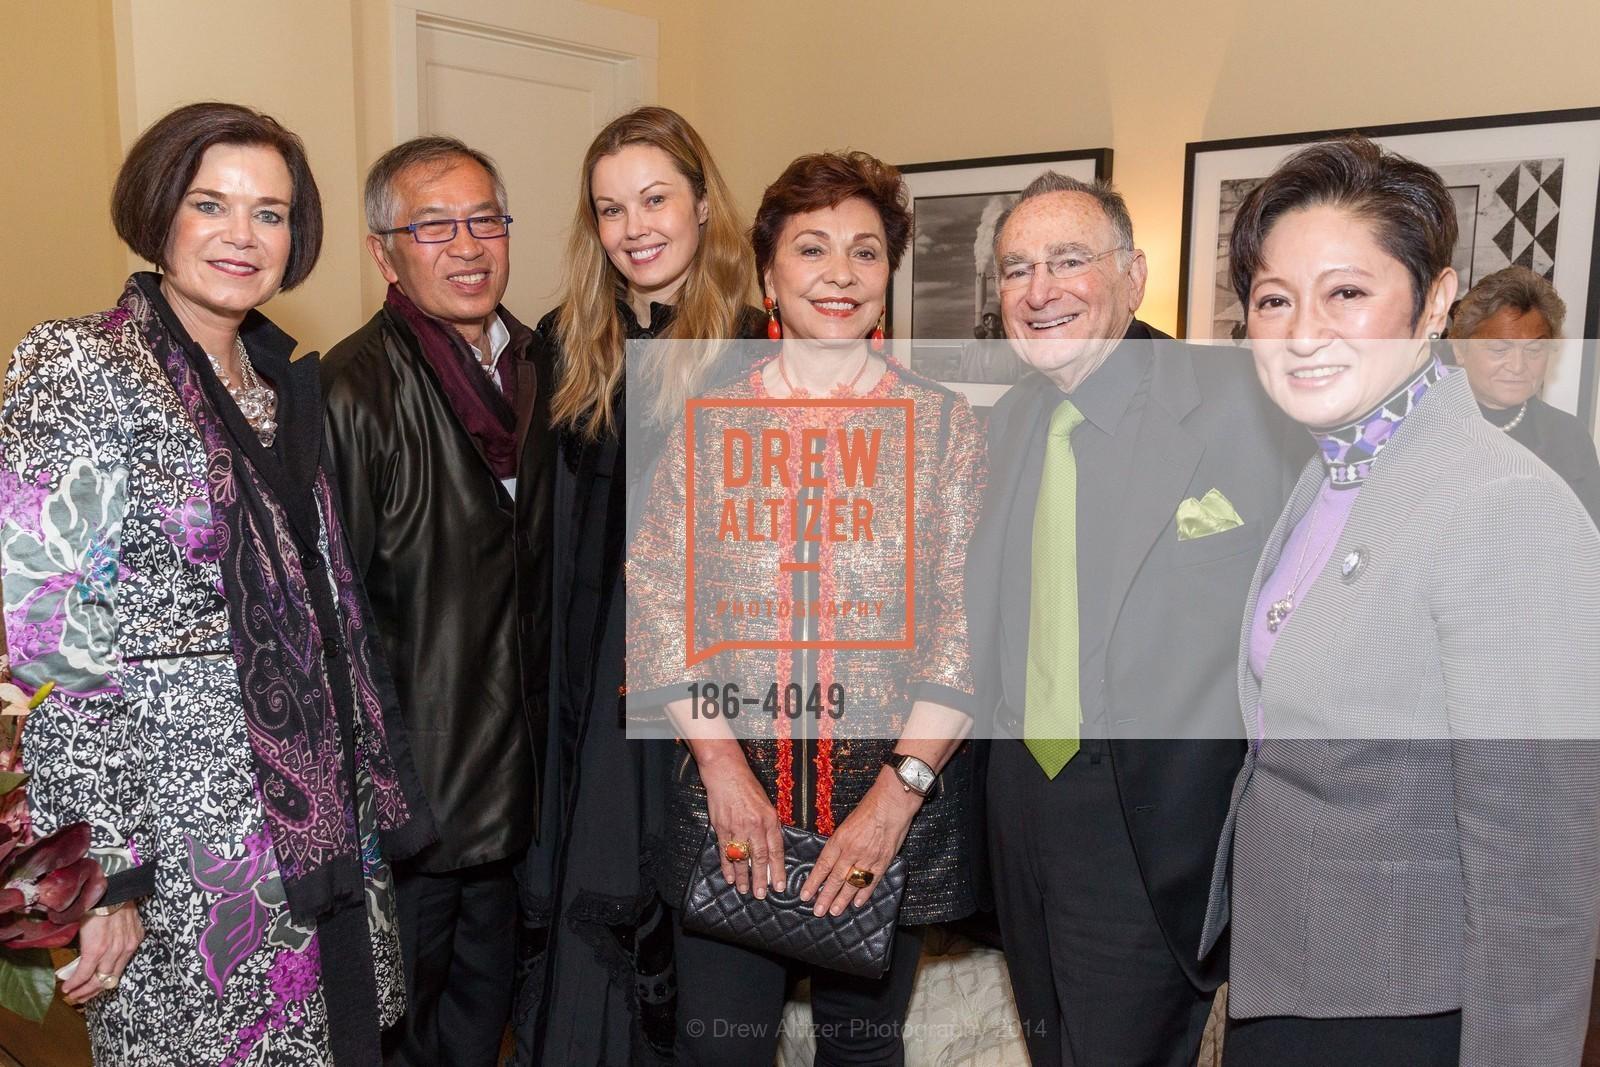 Lucy Buchanan, James Ho, Tatiana Sorokko, Maria Manetti Shrem, Jan Shrem, Doreen Ho, Photo #186-4049